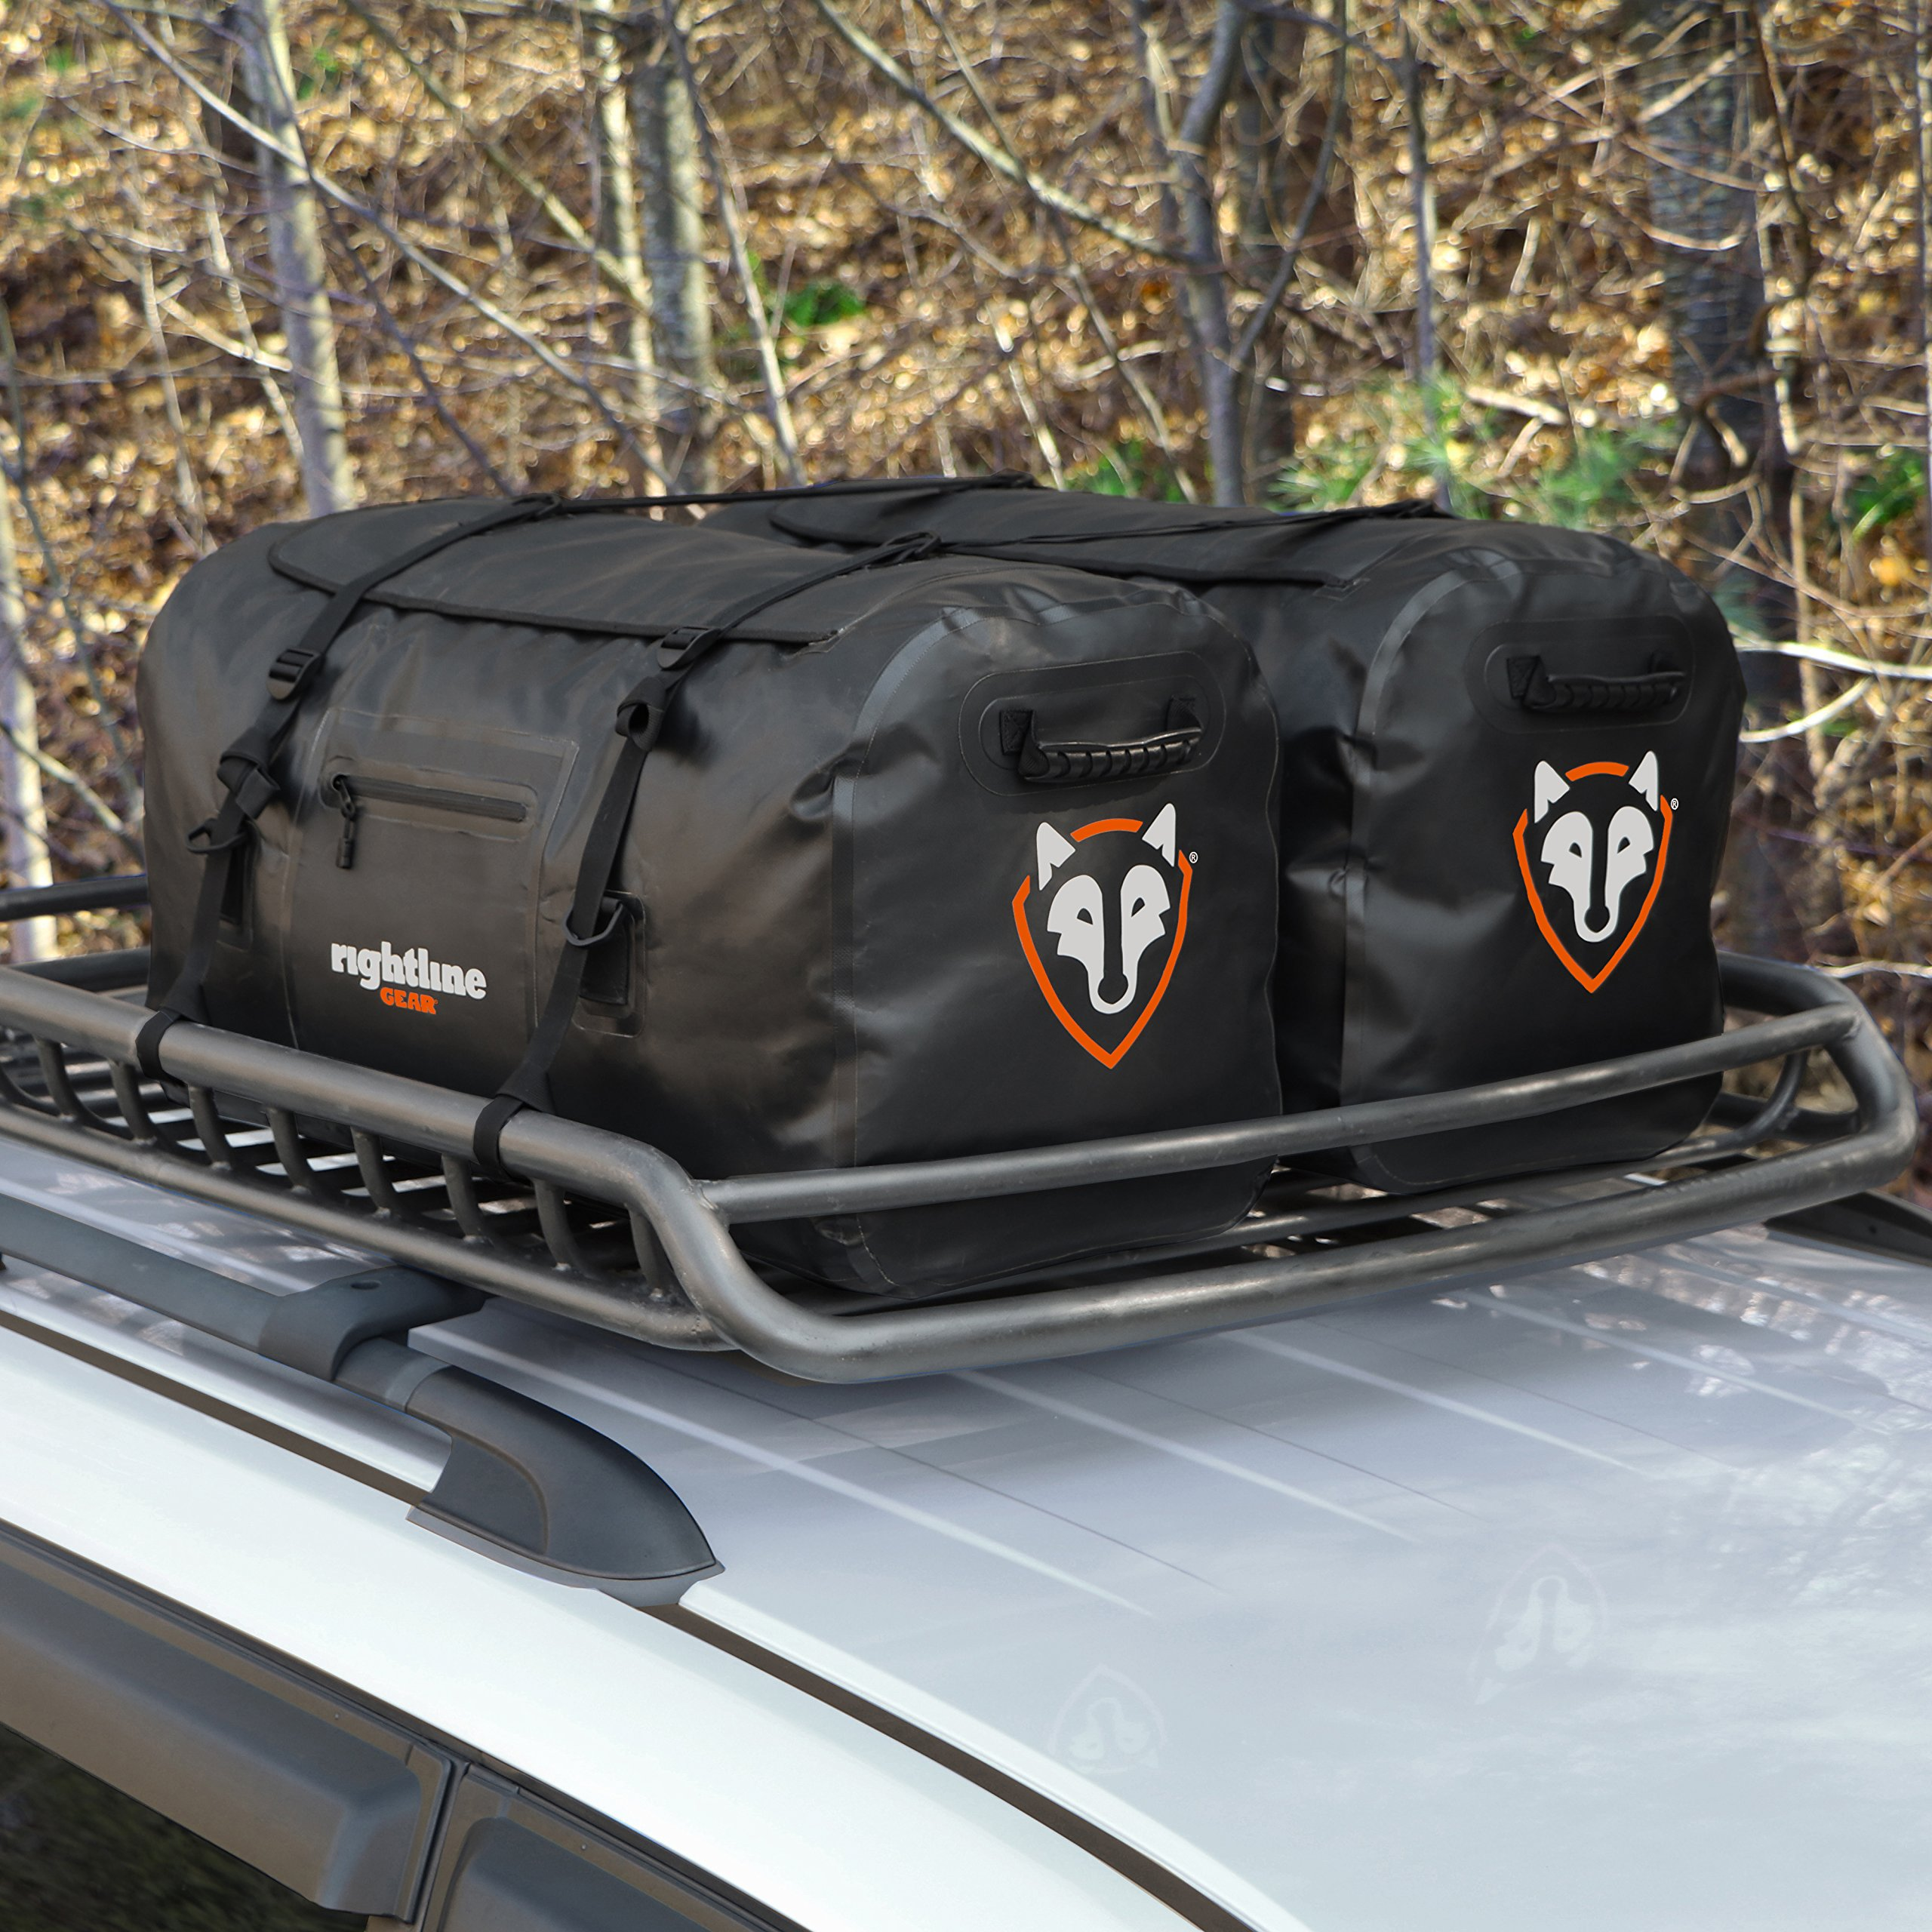 Rightline Gear 100J87-B 4x4 Duffle Bag (120L) by Rightline Gear (Image #3)